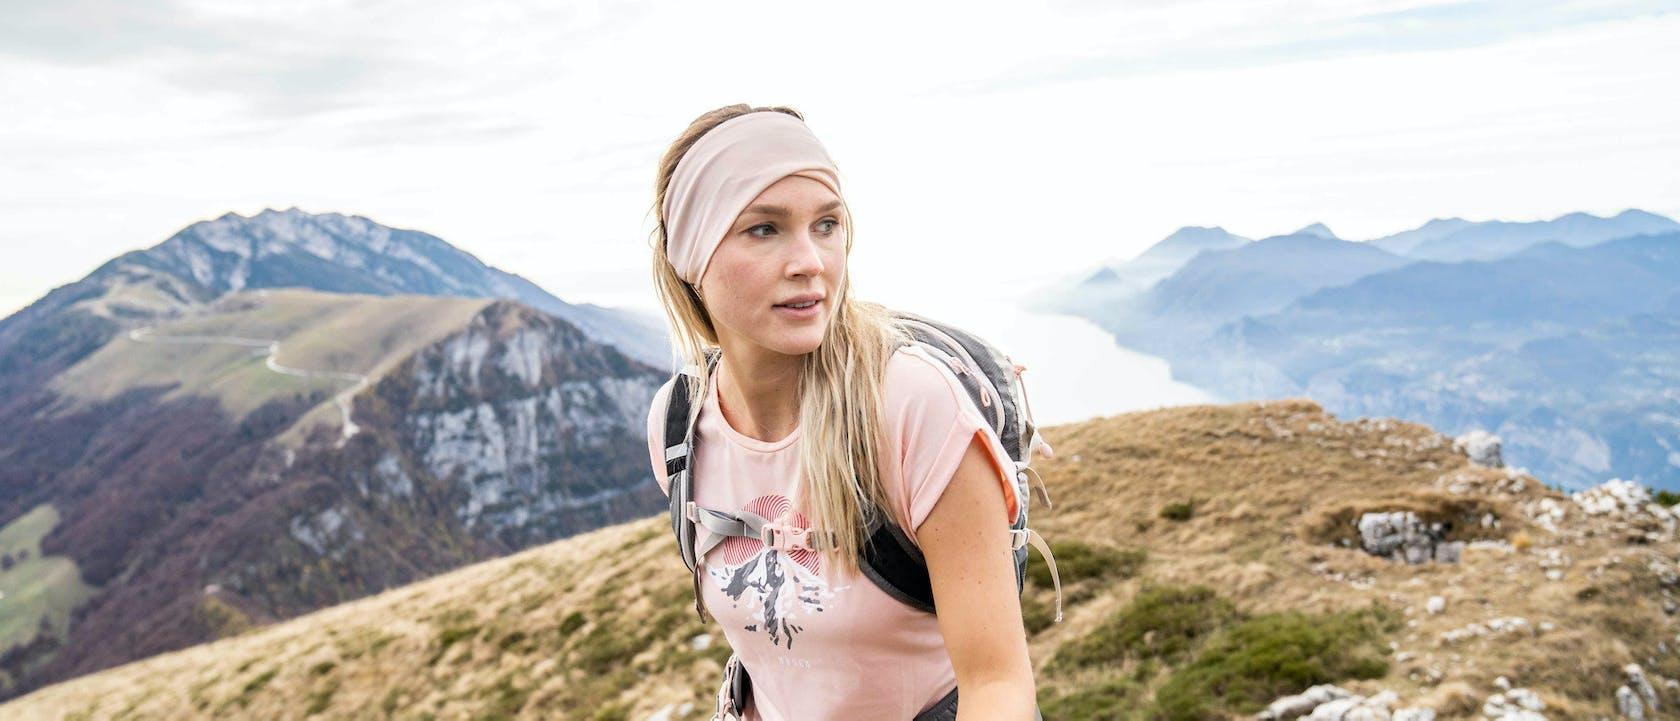 Abbigliamento donna montagna